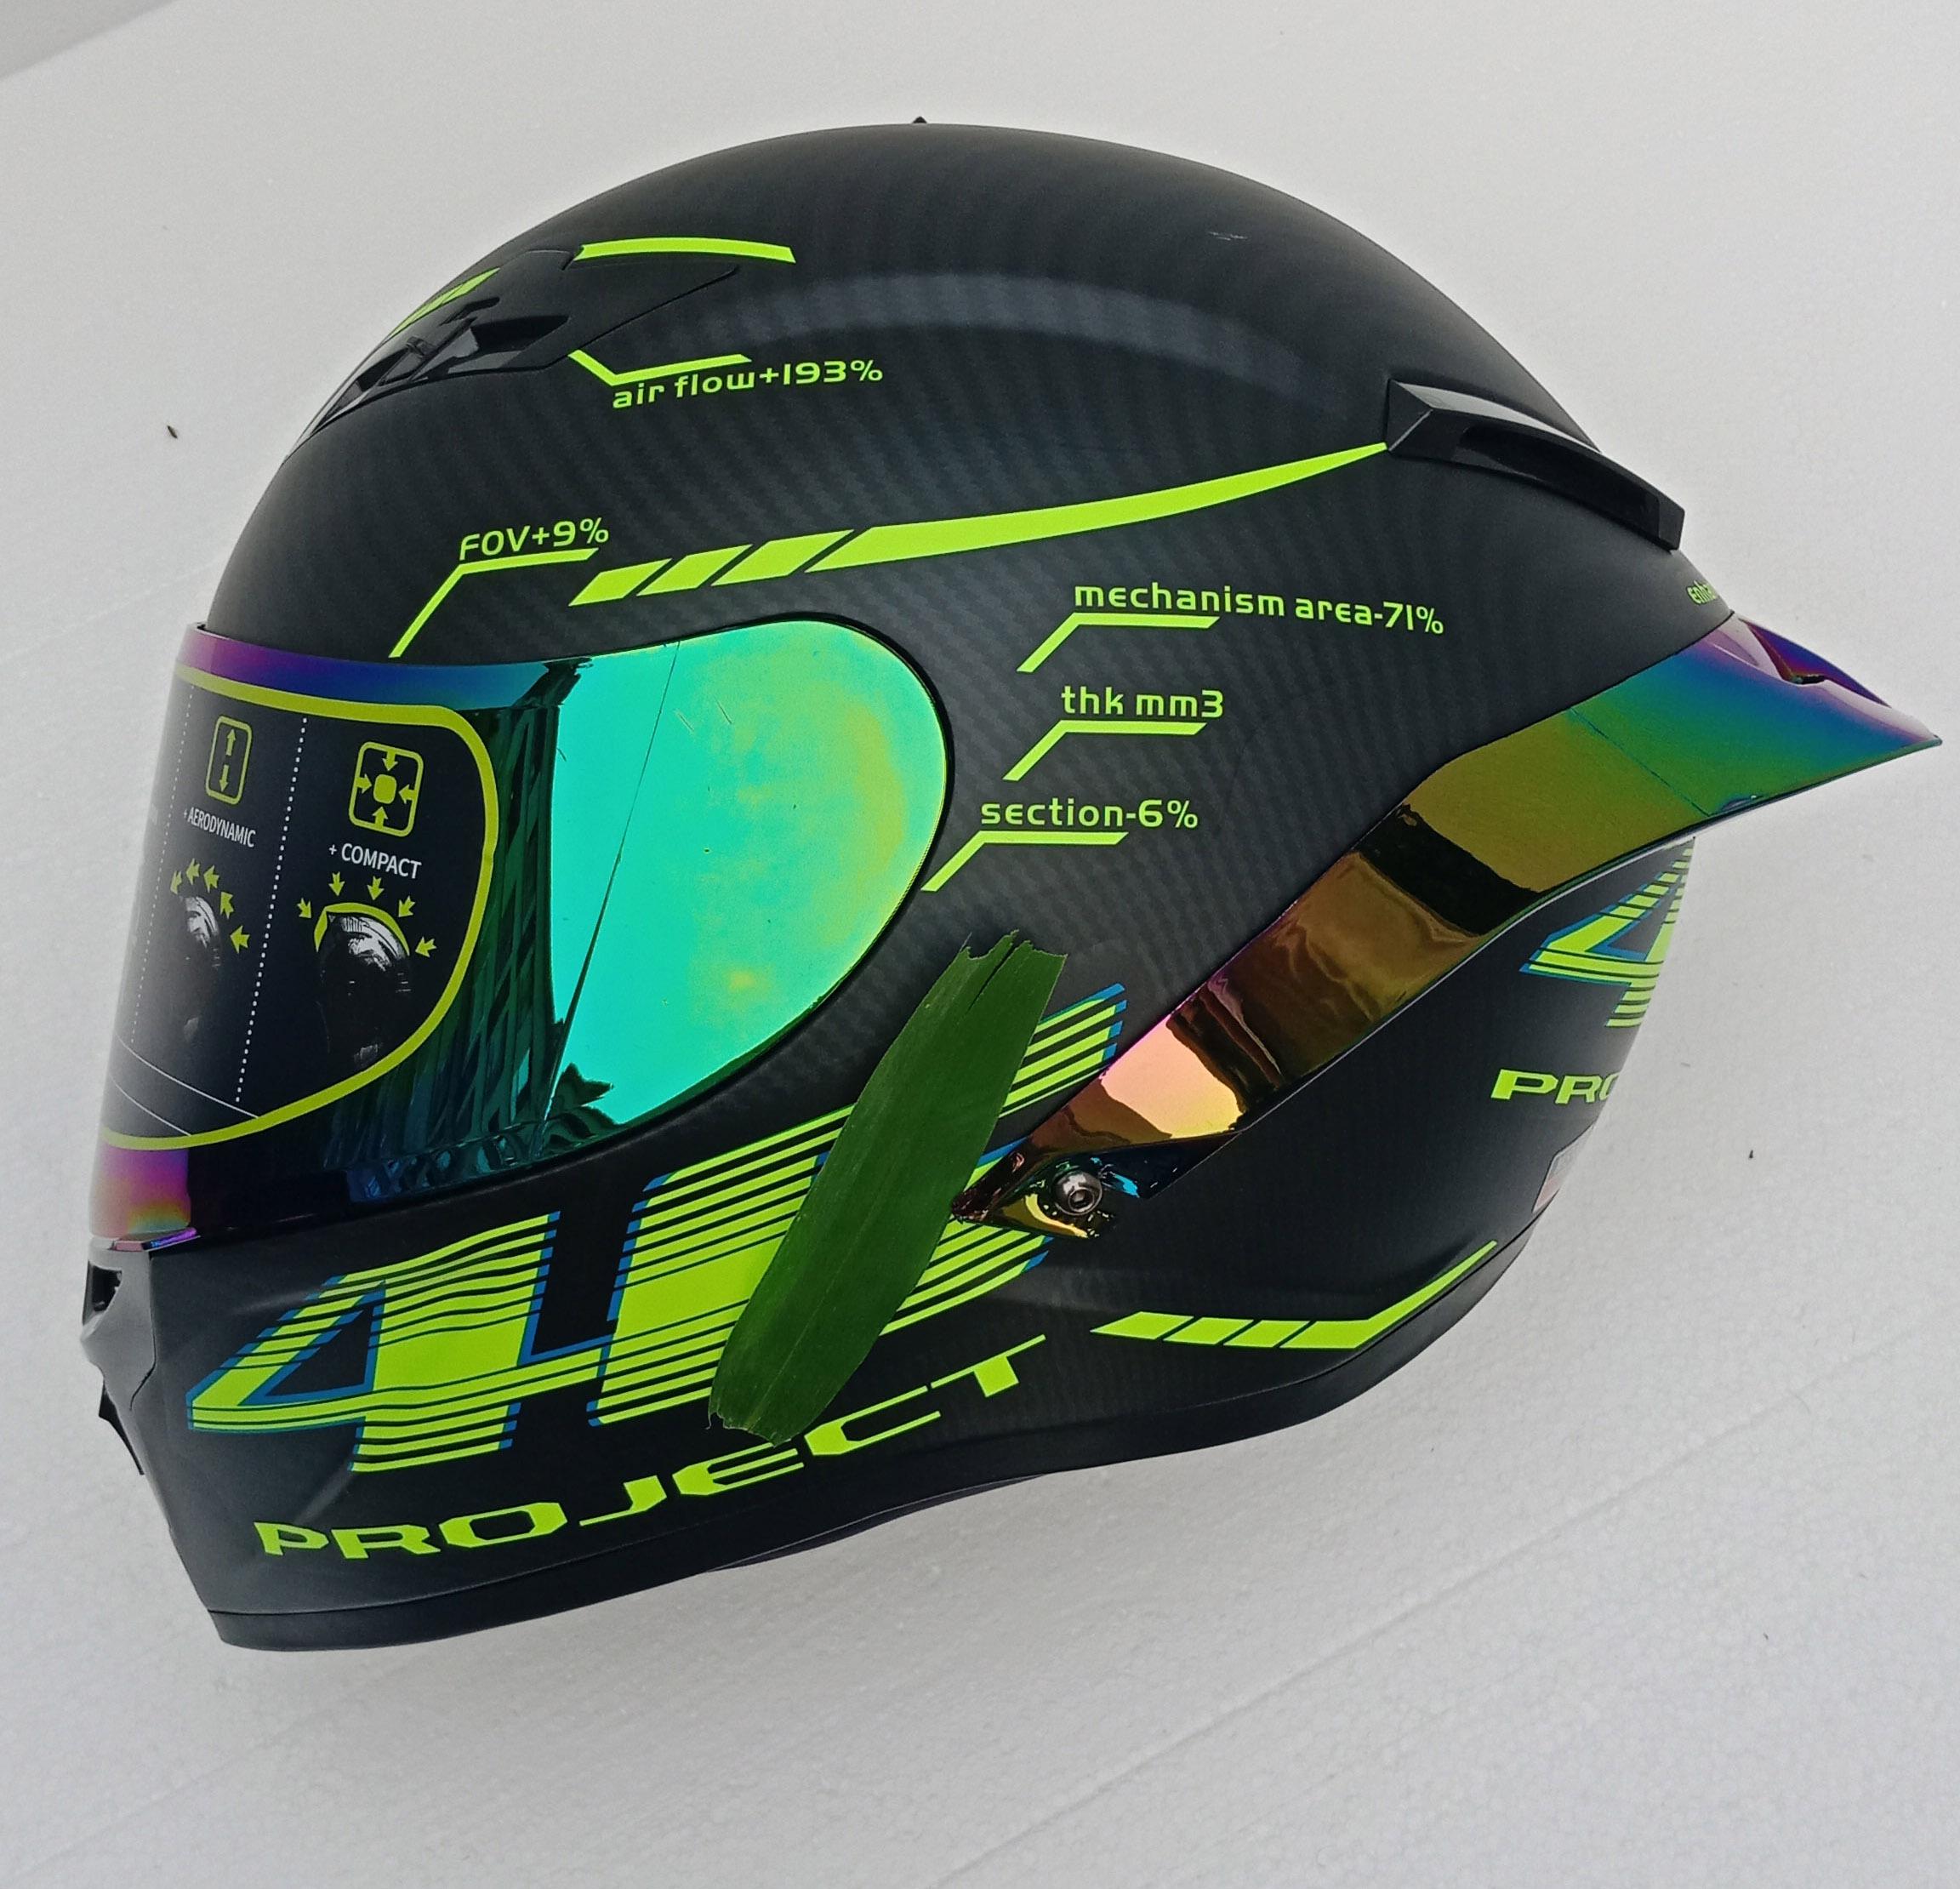 Full Face Carbon Fiber Motorcycle Helmet Professional Racing Helmet Kask DOT Rainbow Visor Motocross Off Road Touring